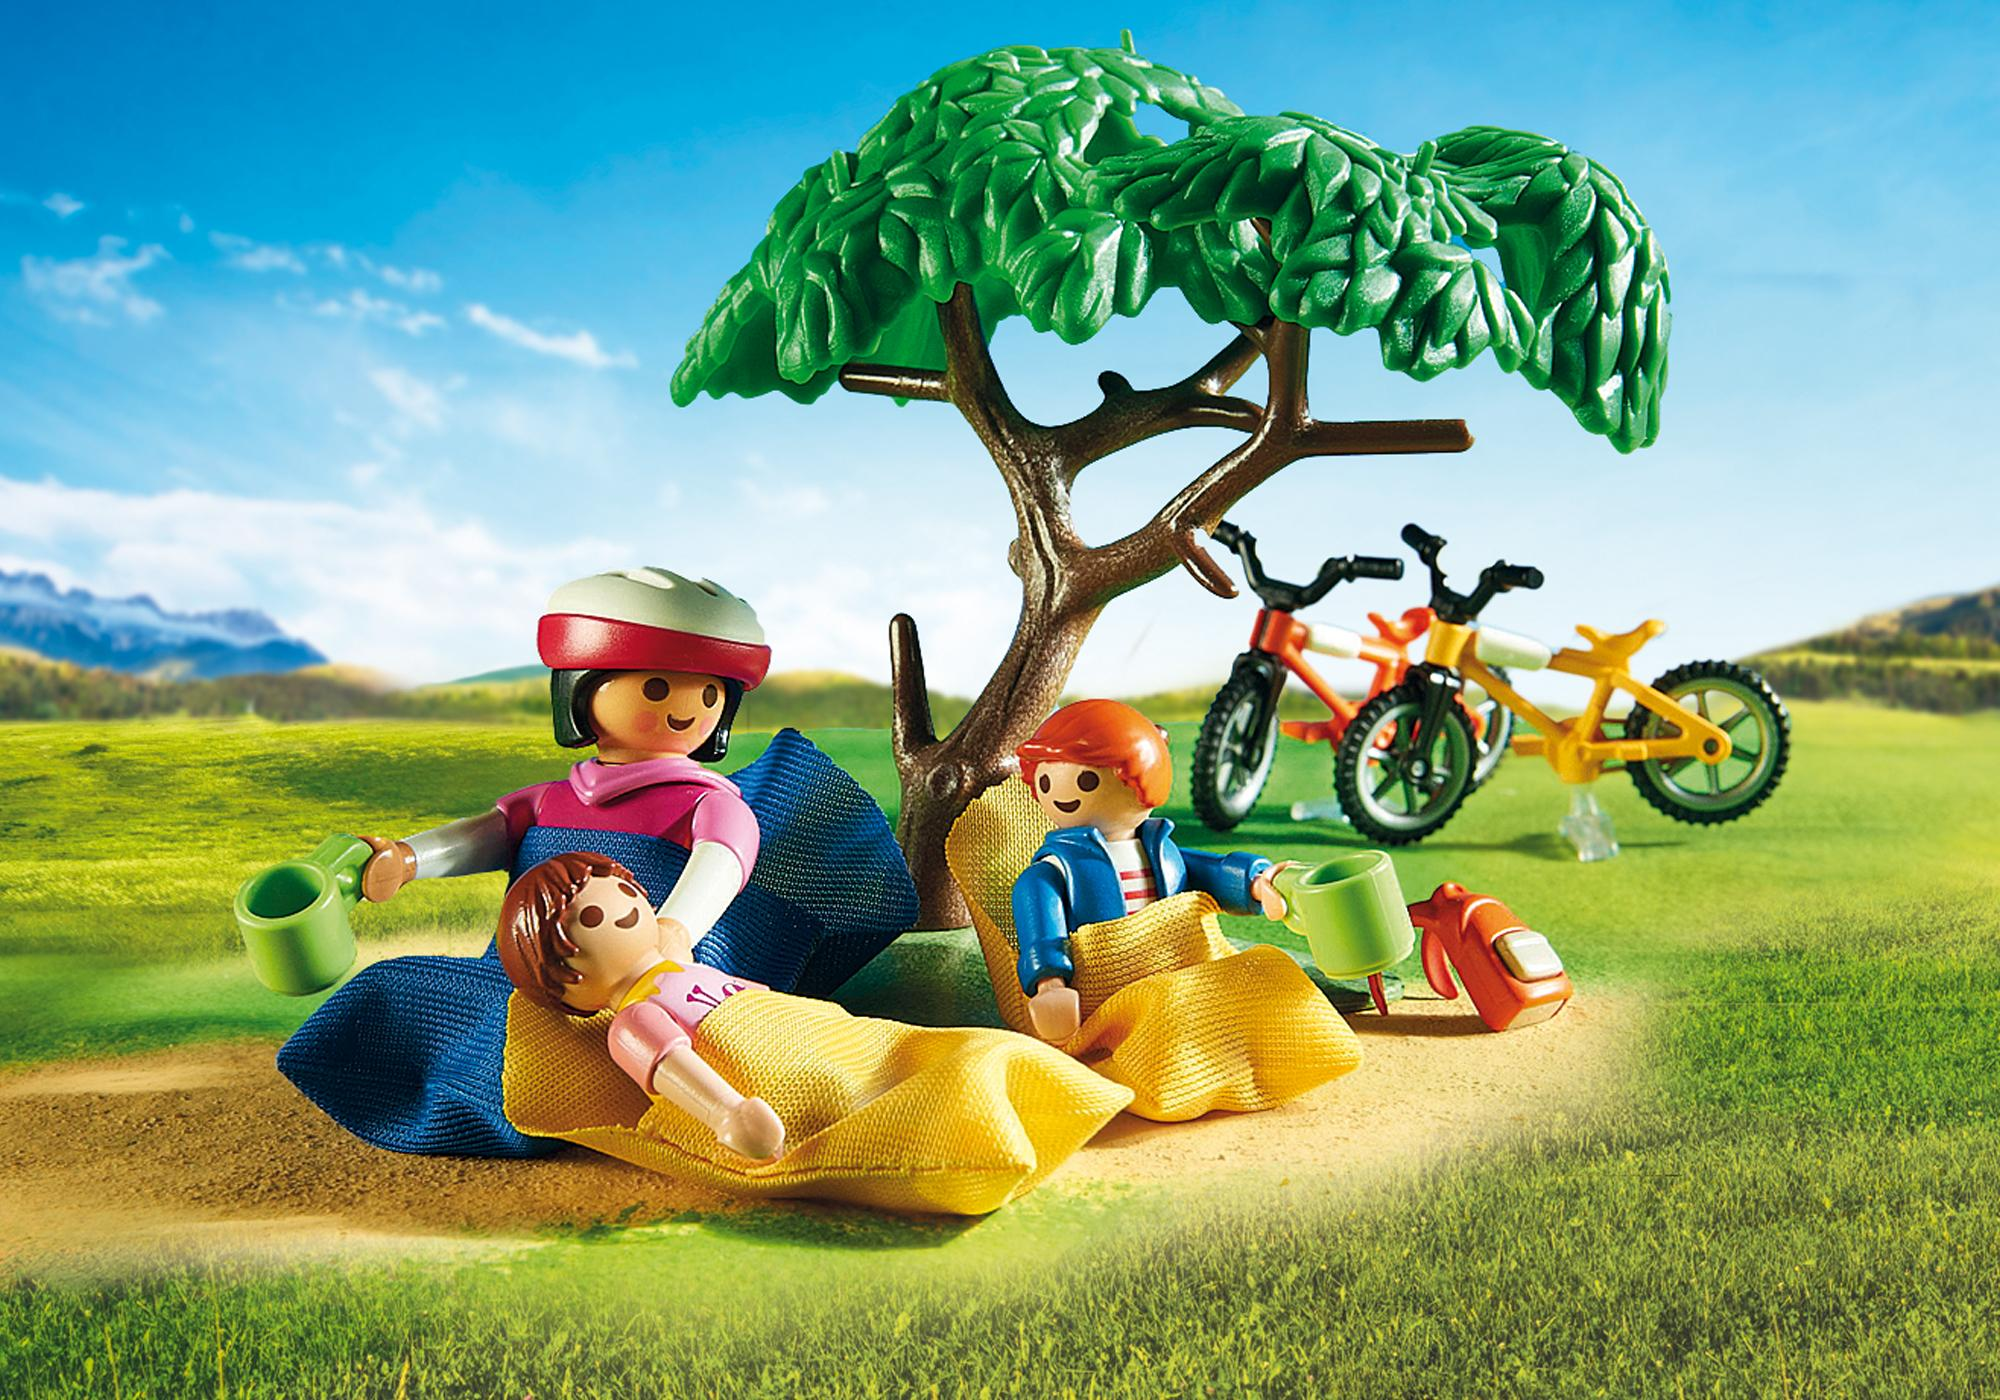 http://media.playmobil.com/i/playmobil/6890_product_extra1